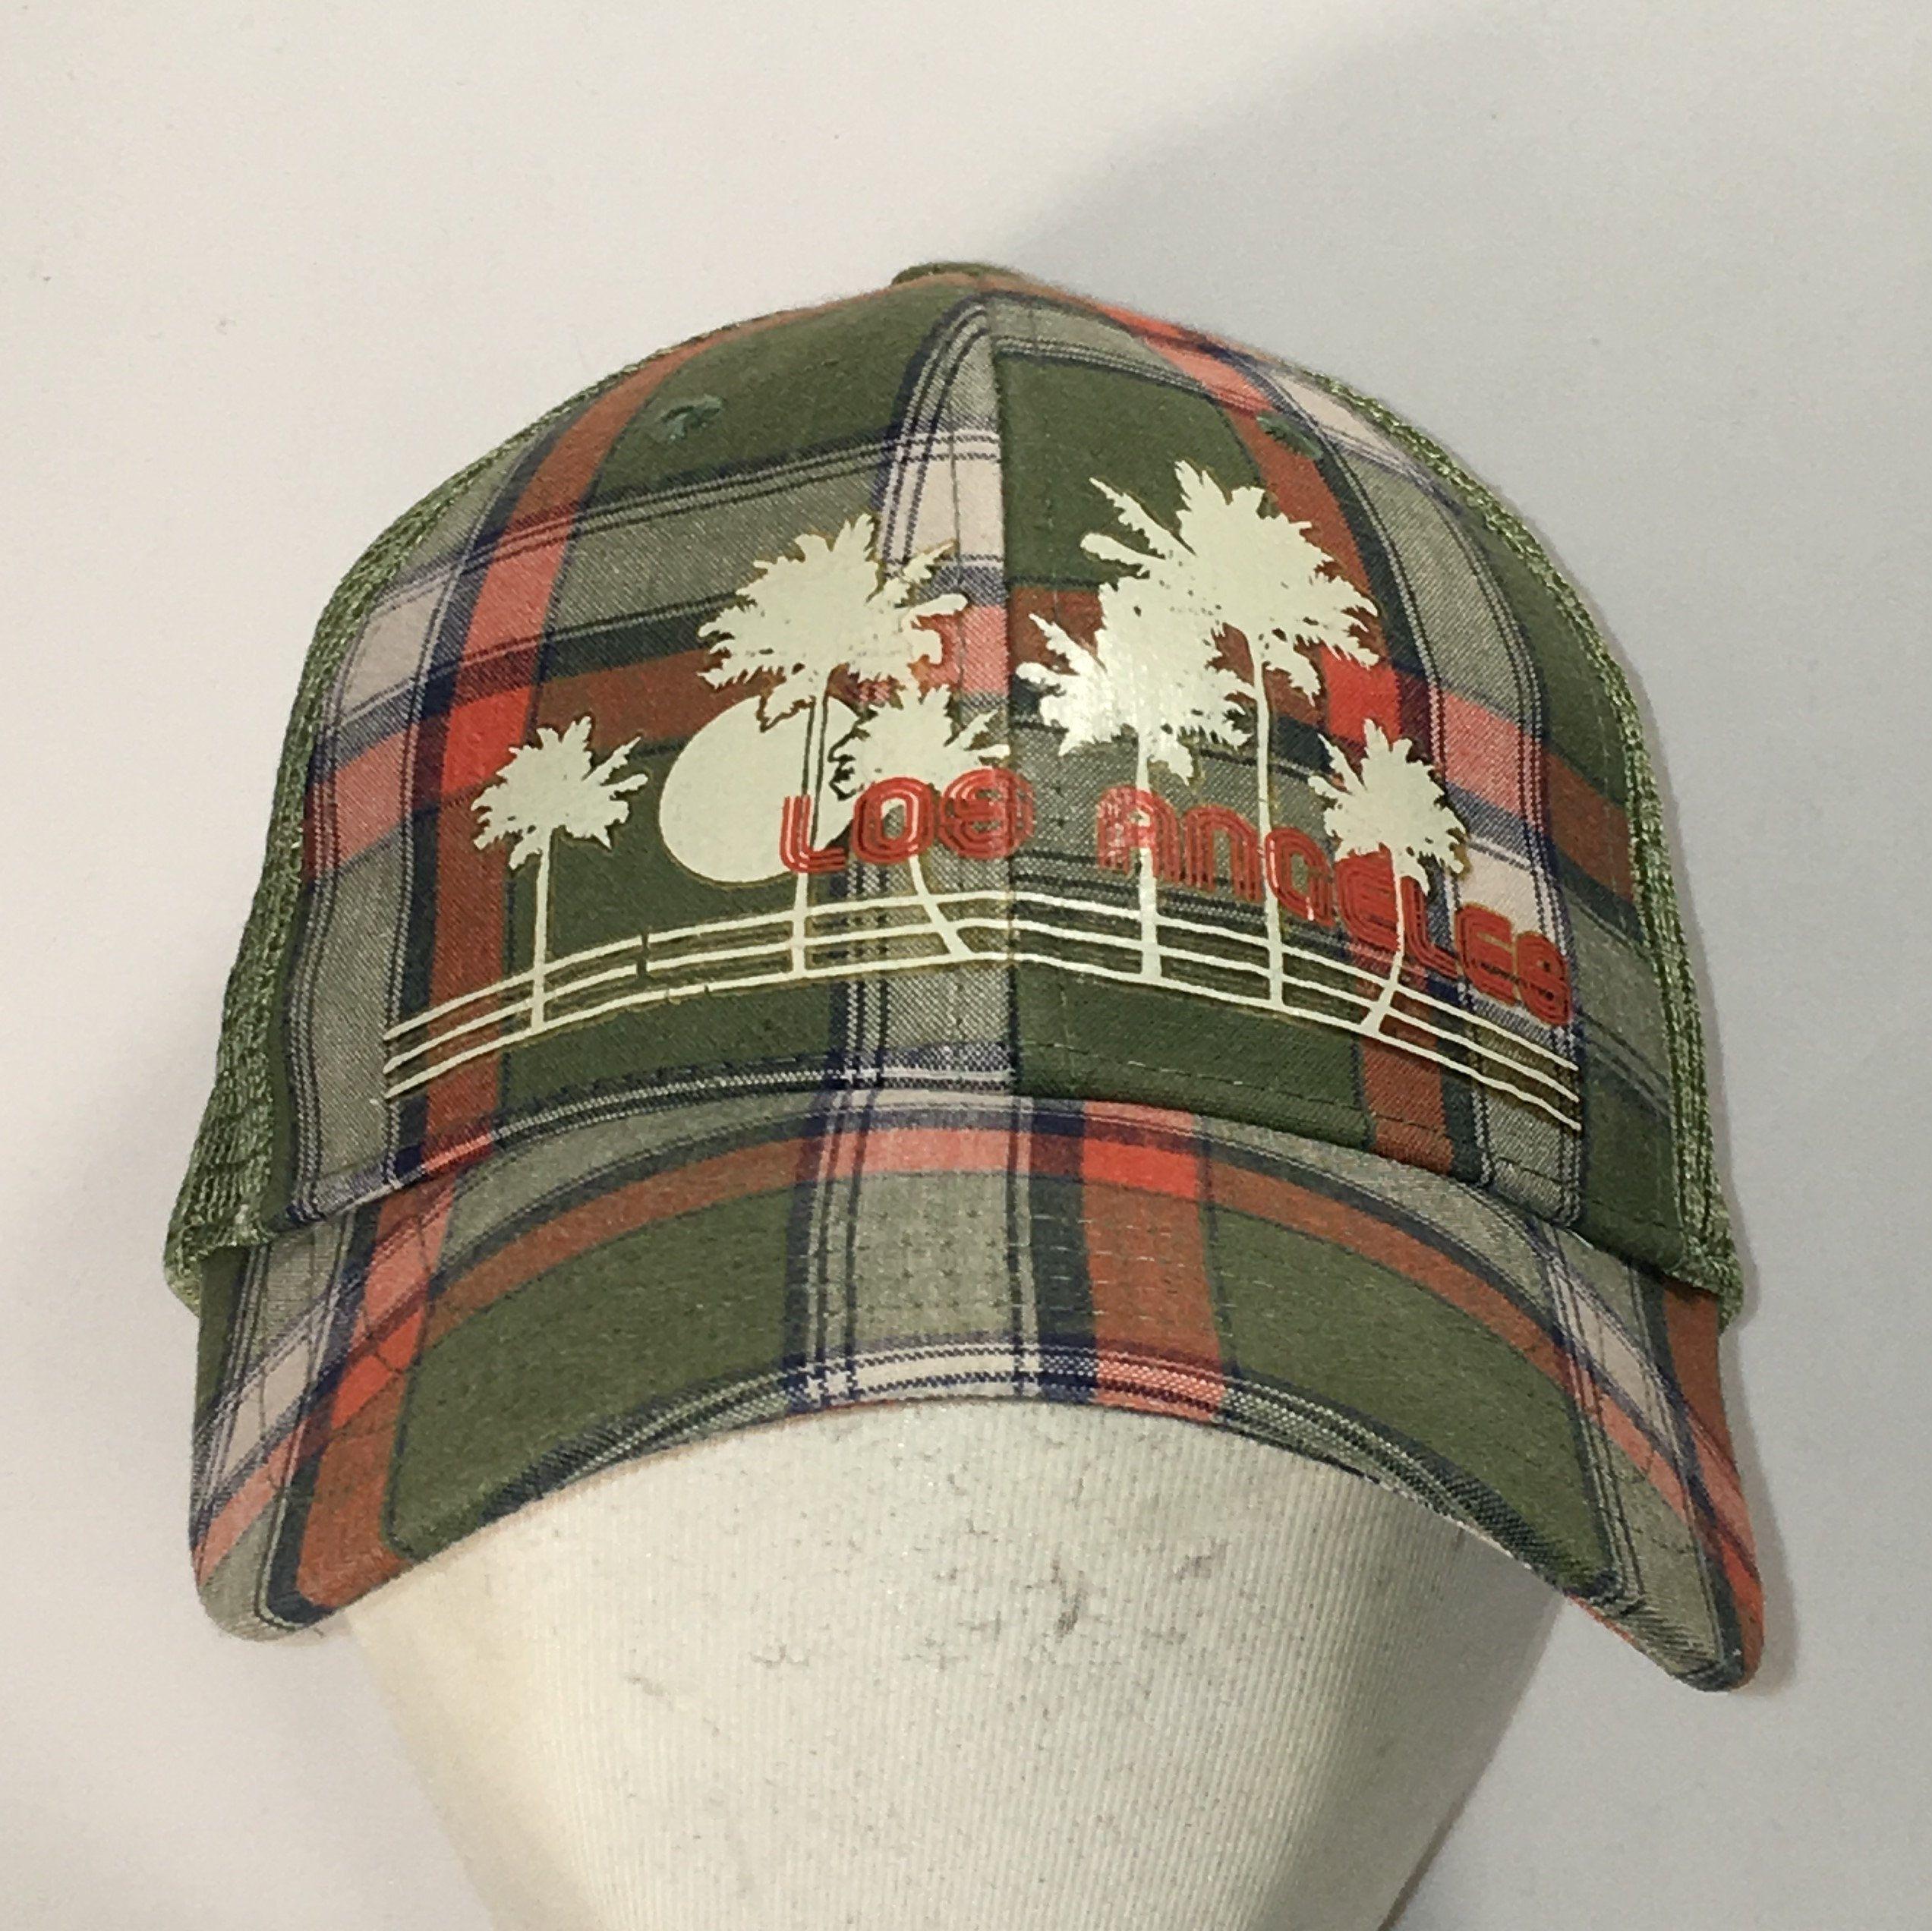 734fa4c31 Vintage Snapback Plaid Hat Los Angeles Mesh Back Baseball Cap ...